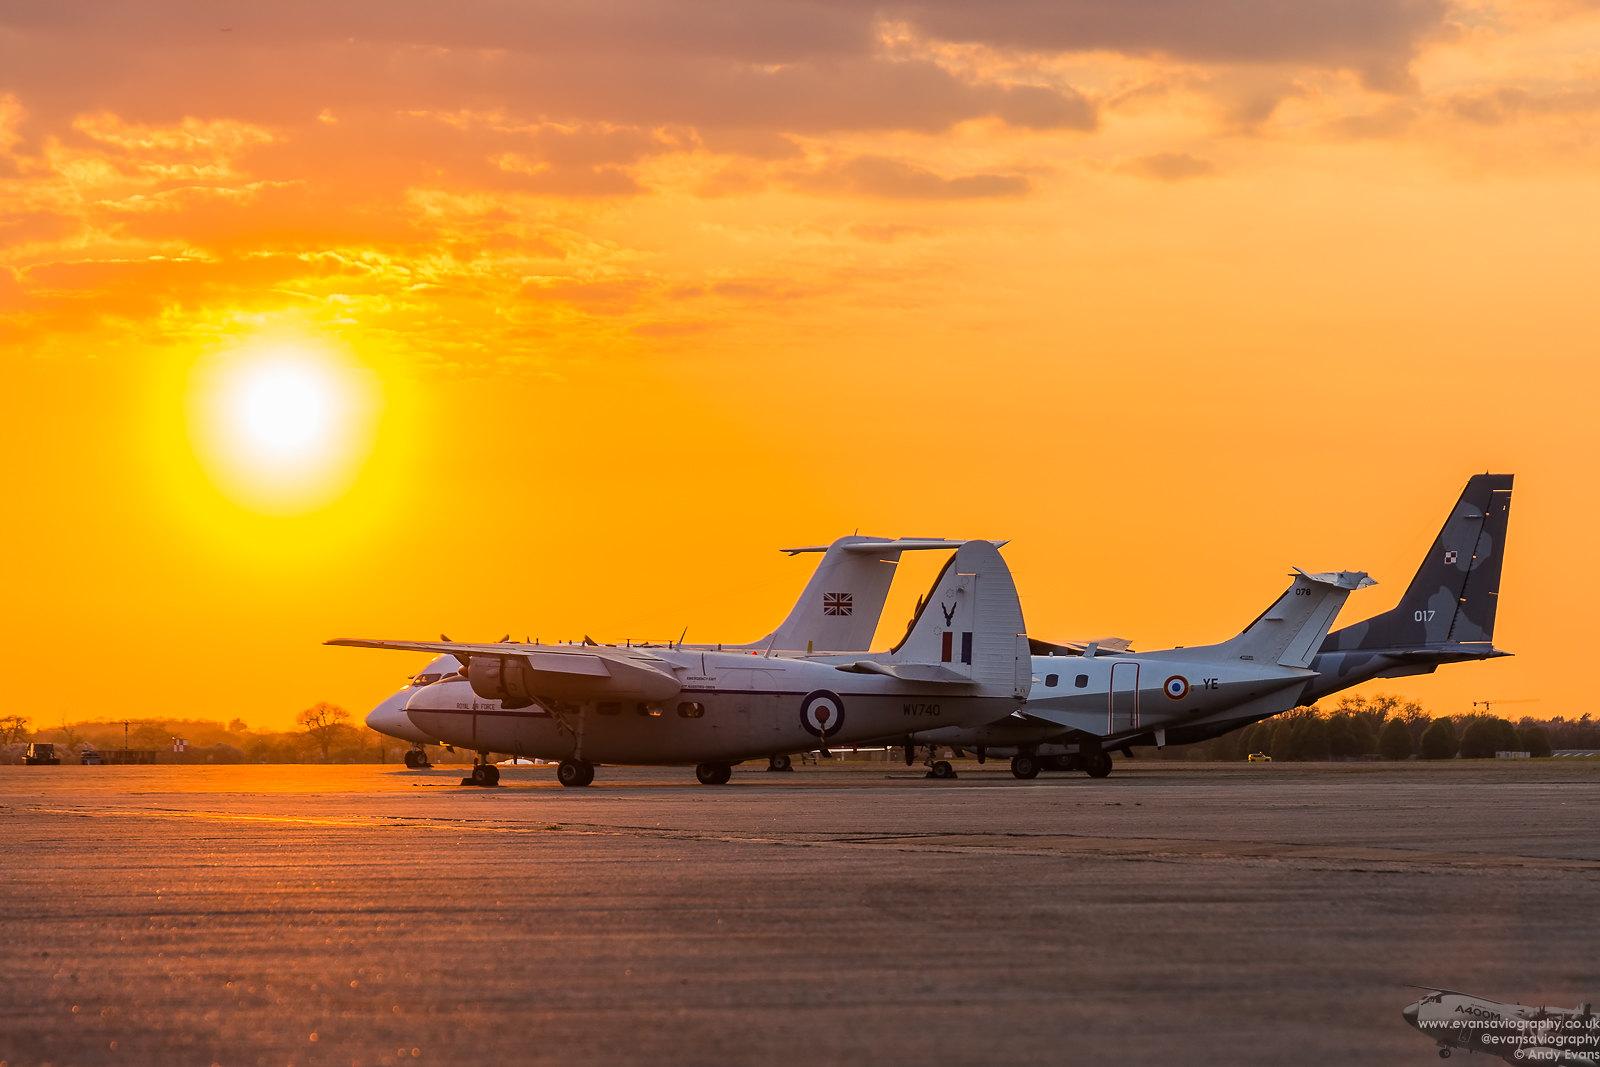 RAF Northolt Nightshoot XXIVa April 2018